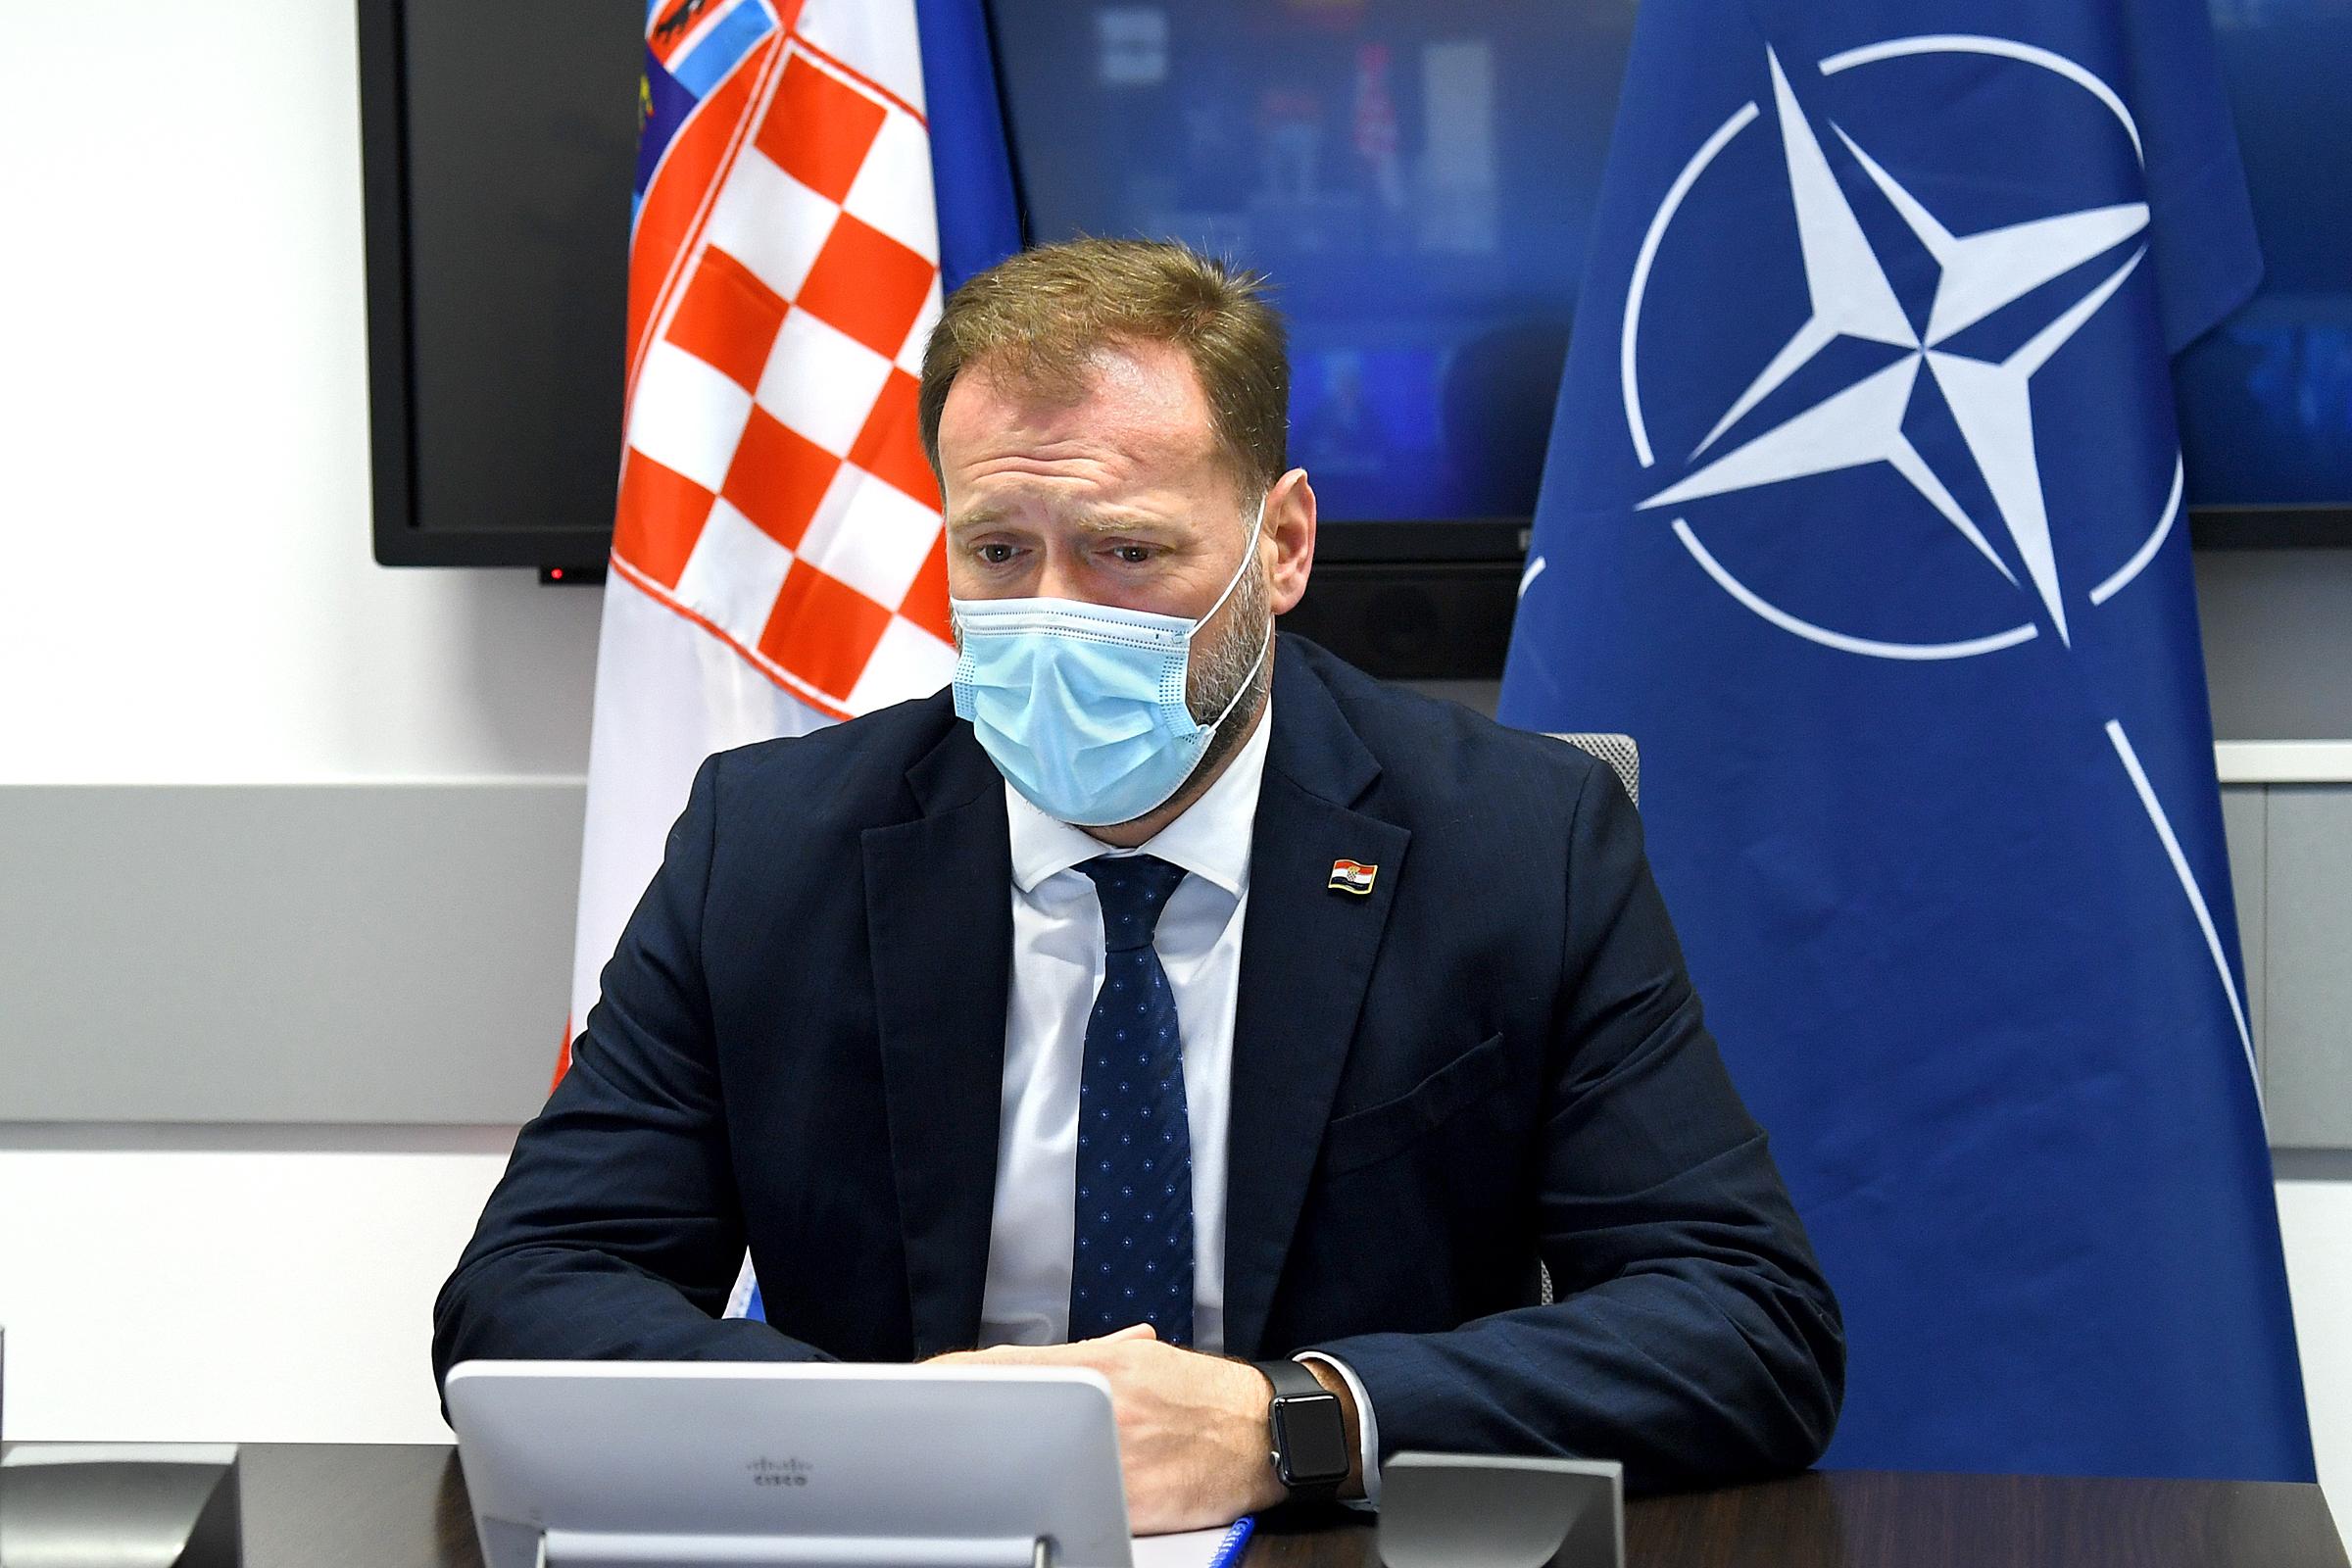 Ministar Banožić na sastanku NATO ministara obrane